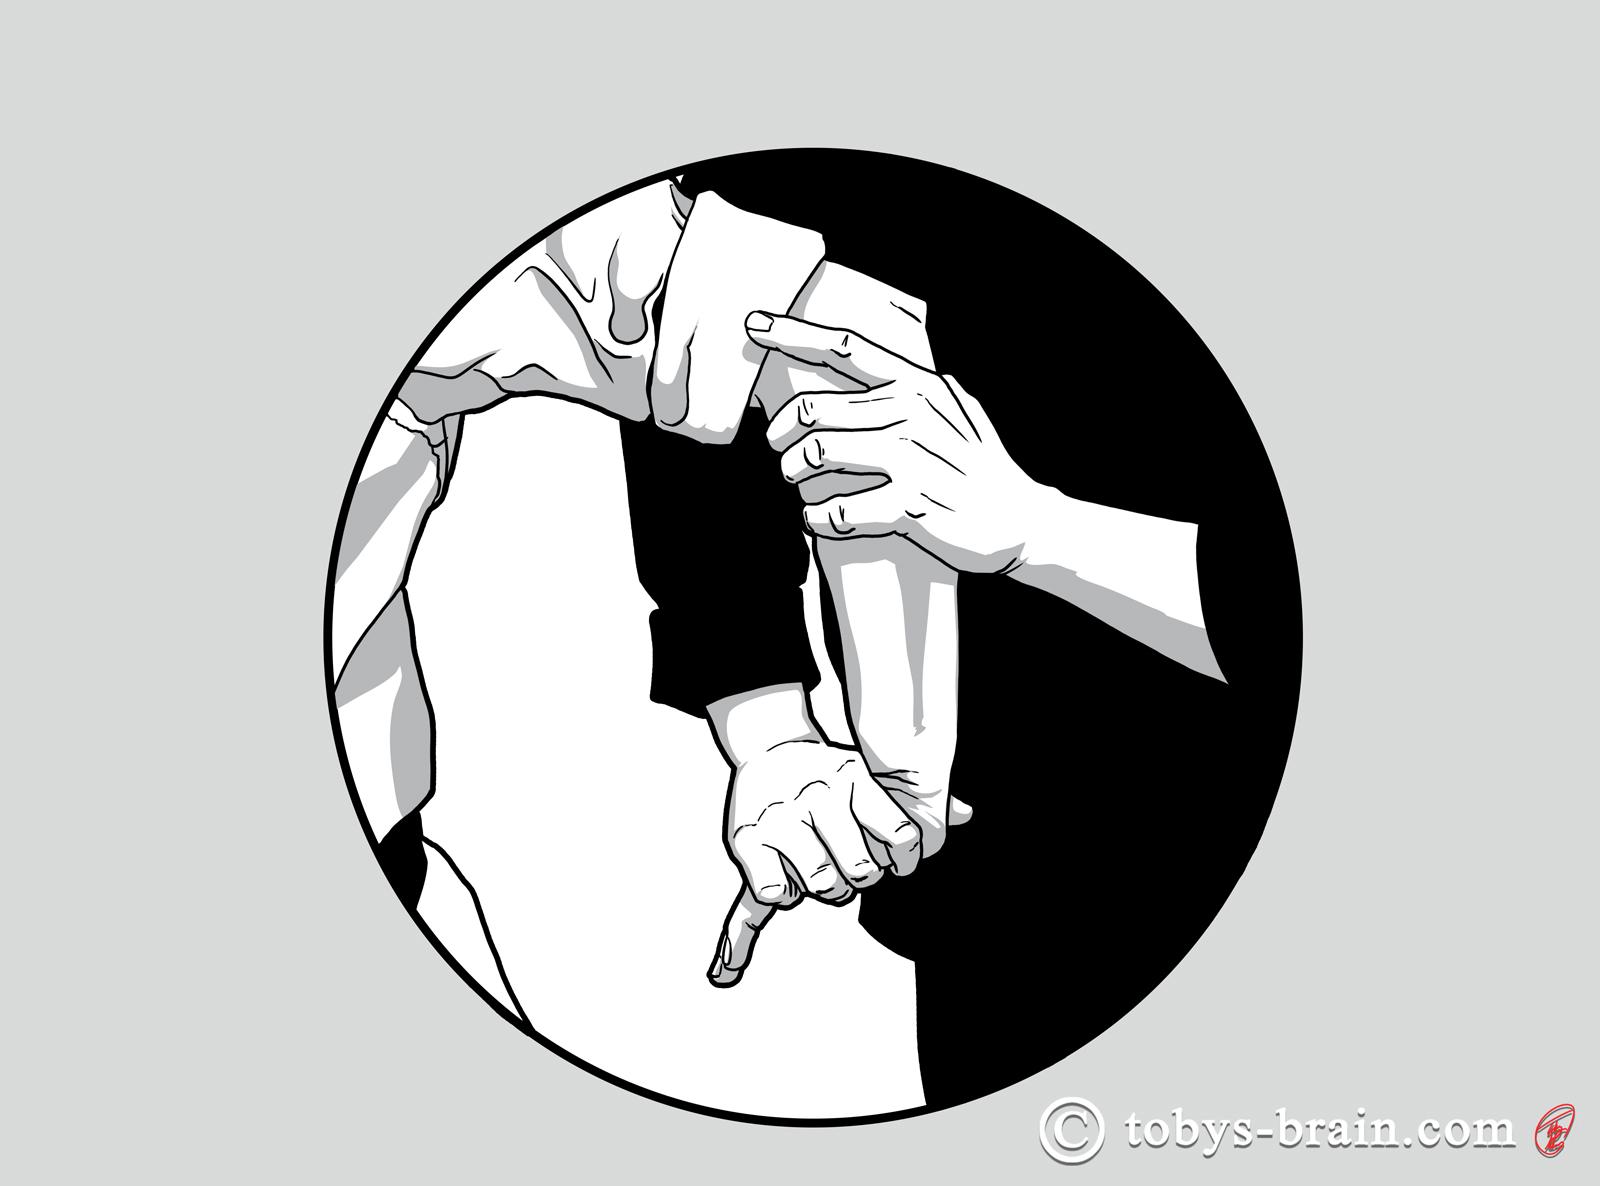 toby-gray-ten-tigers-wrist-lock-3